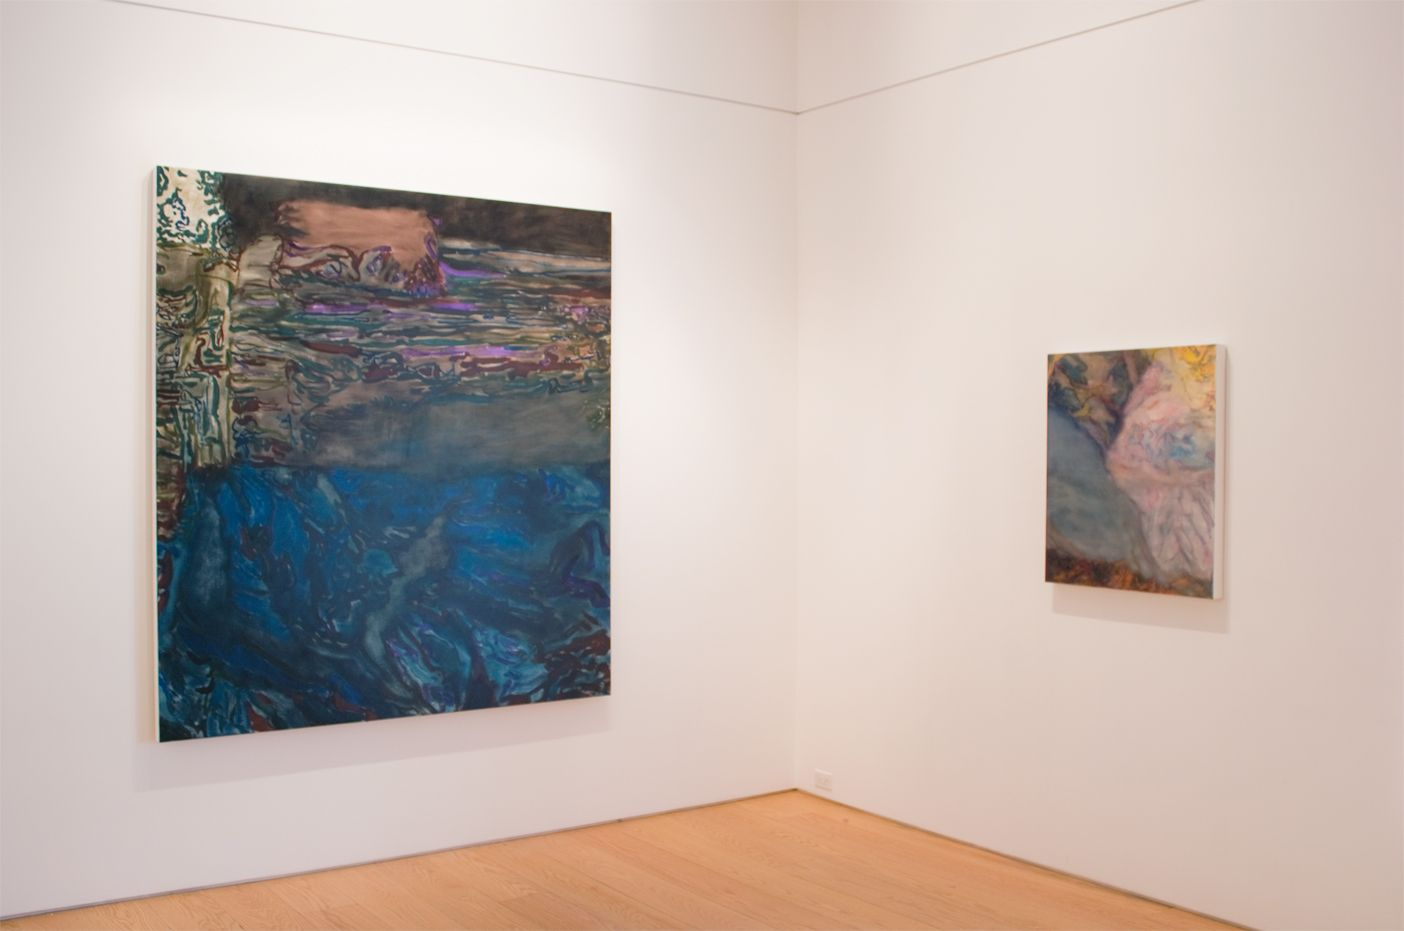 Liliane Tomasko Into the Darkness installation view